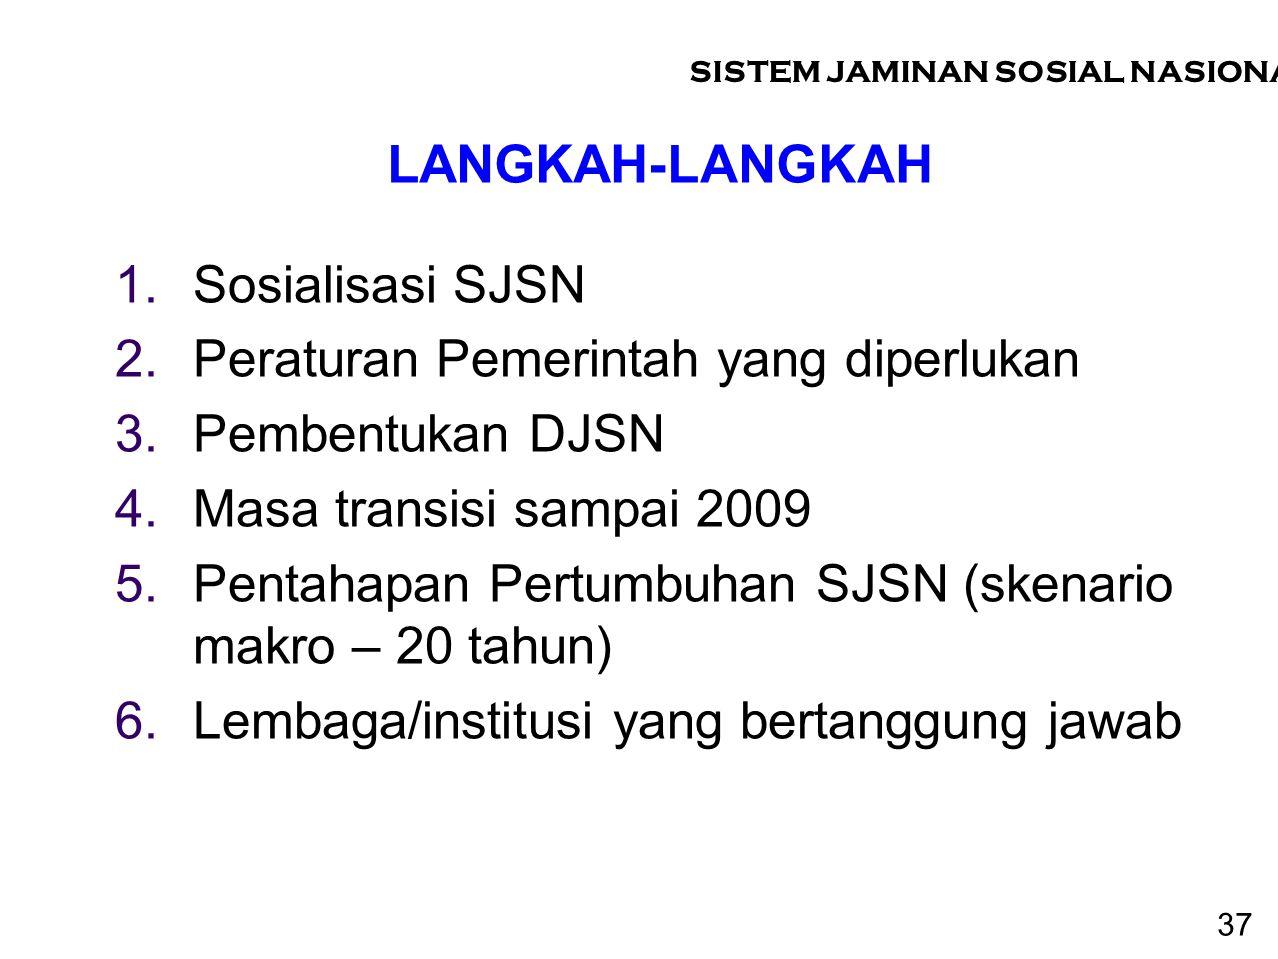 LANGKAH-LANGKAH 1.Sosialisasi SJSN 2.Peraturan Pemerintah yang diperlukan 3.Pembentukan DJSN 4.Masa transisi sampai 2009 5.Pentahapan Pertumbuhan SJSN